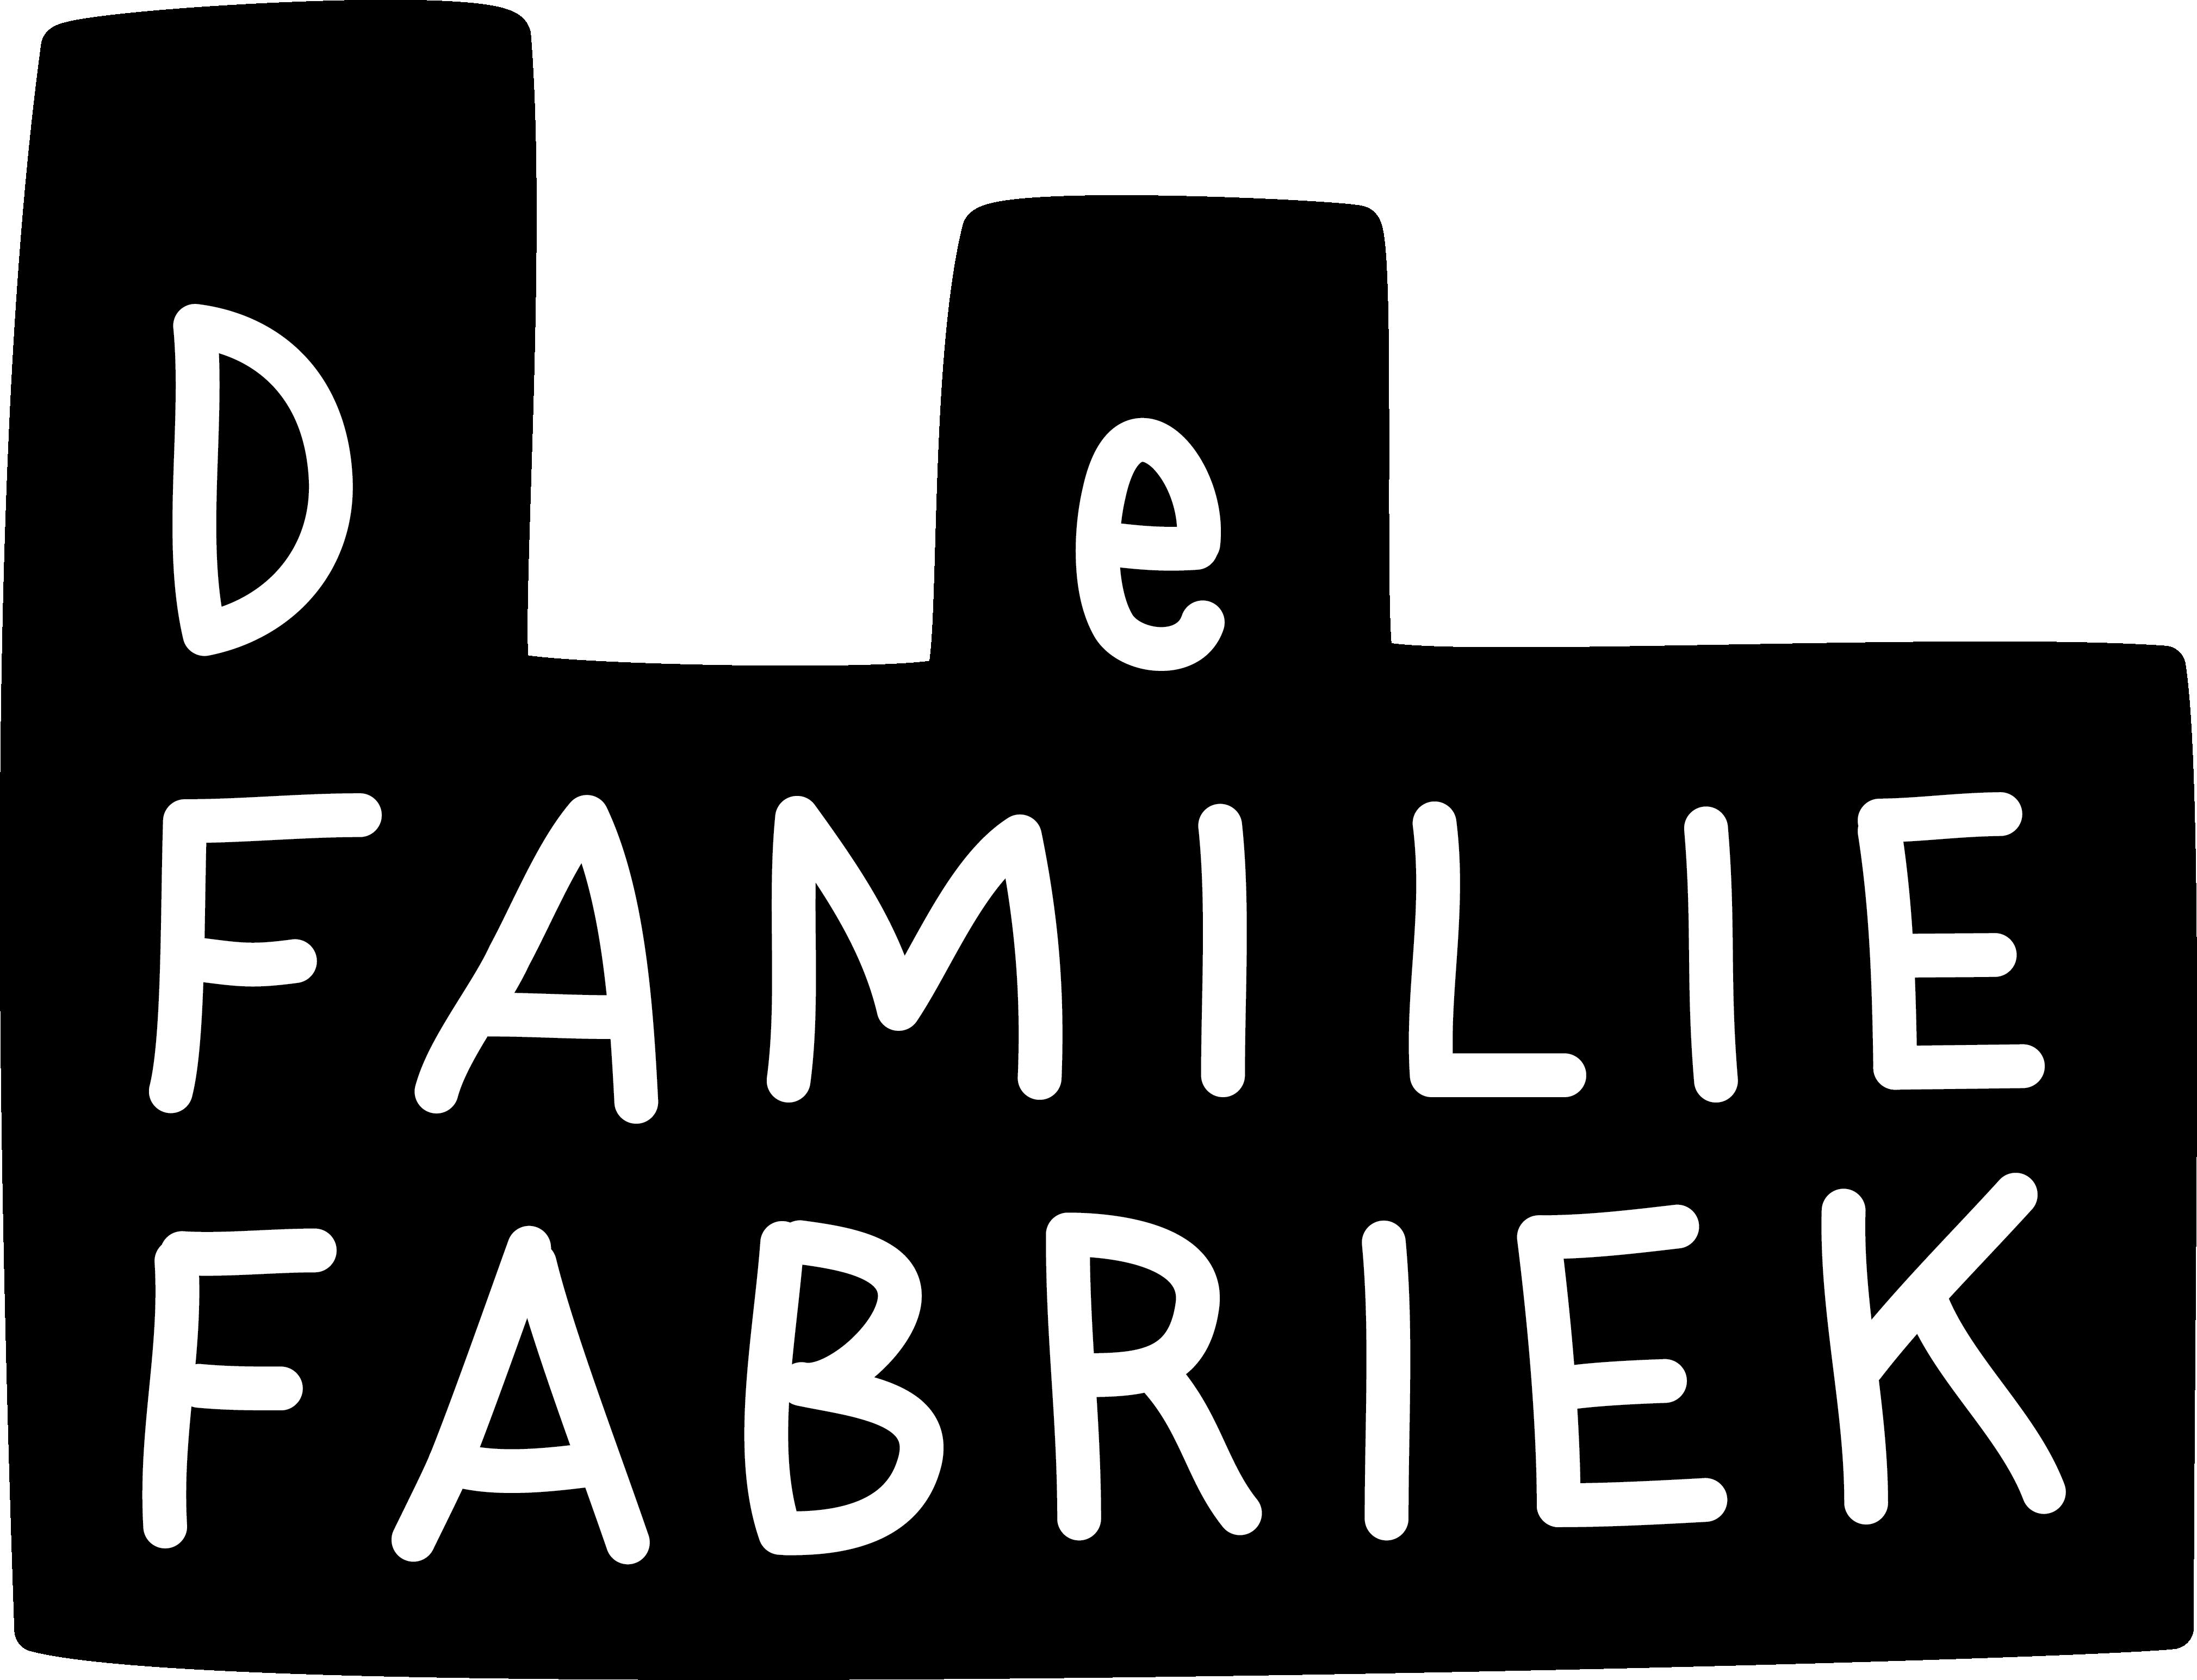 De Familiefabriek